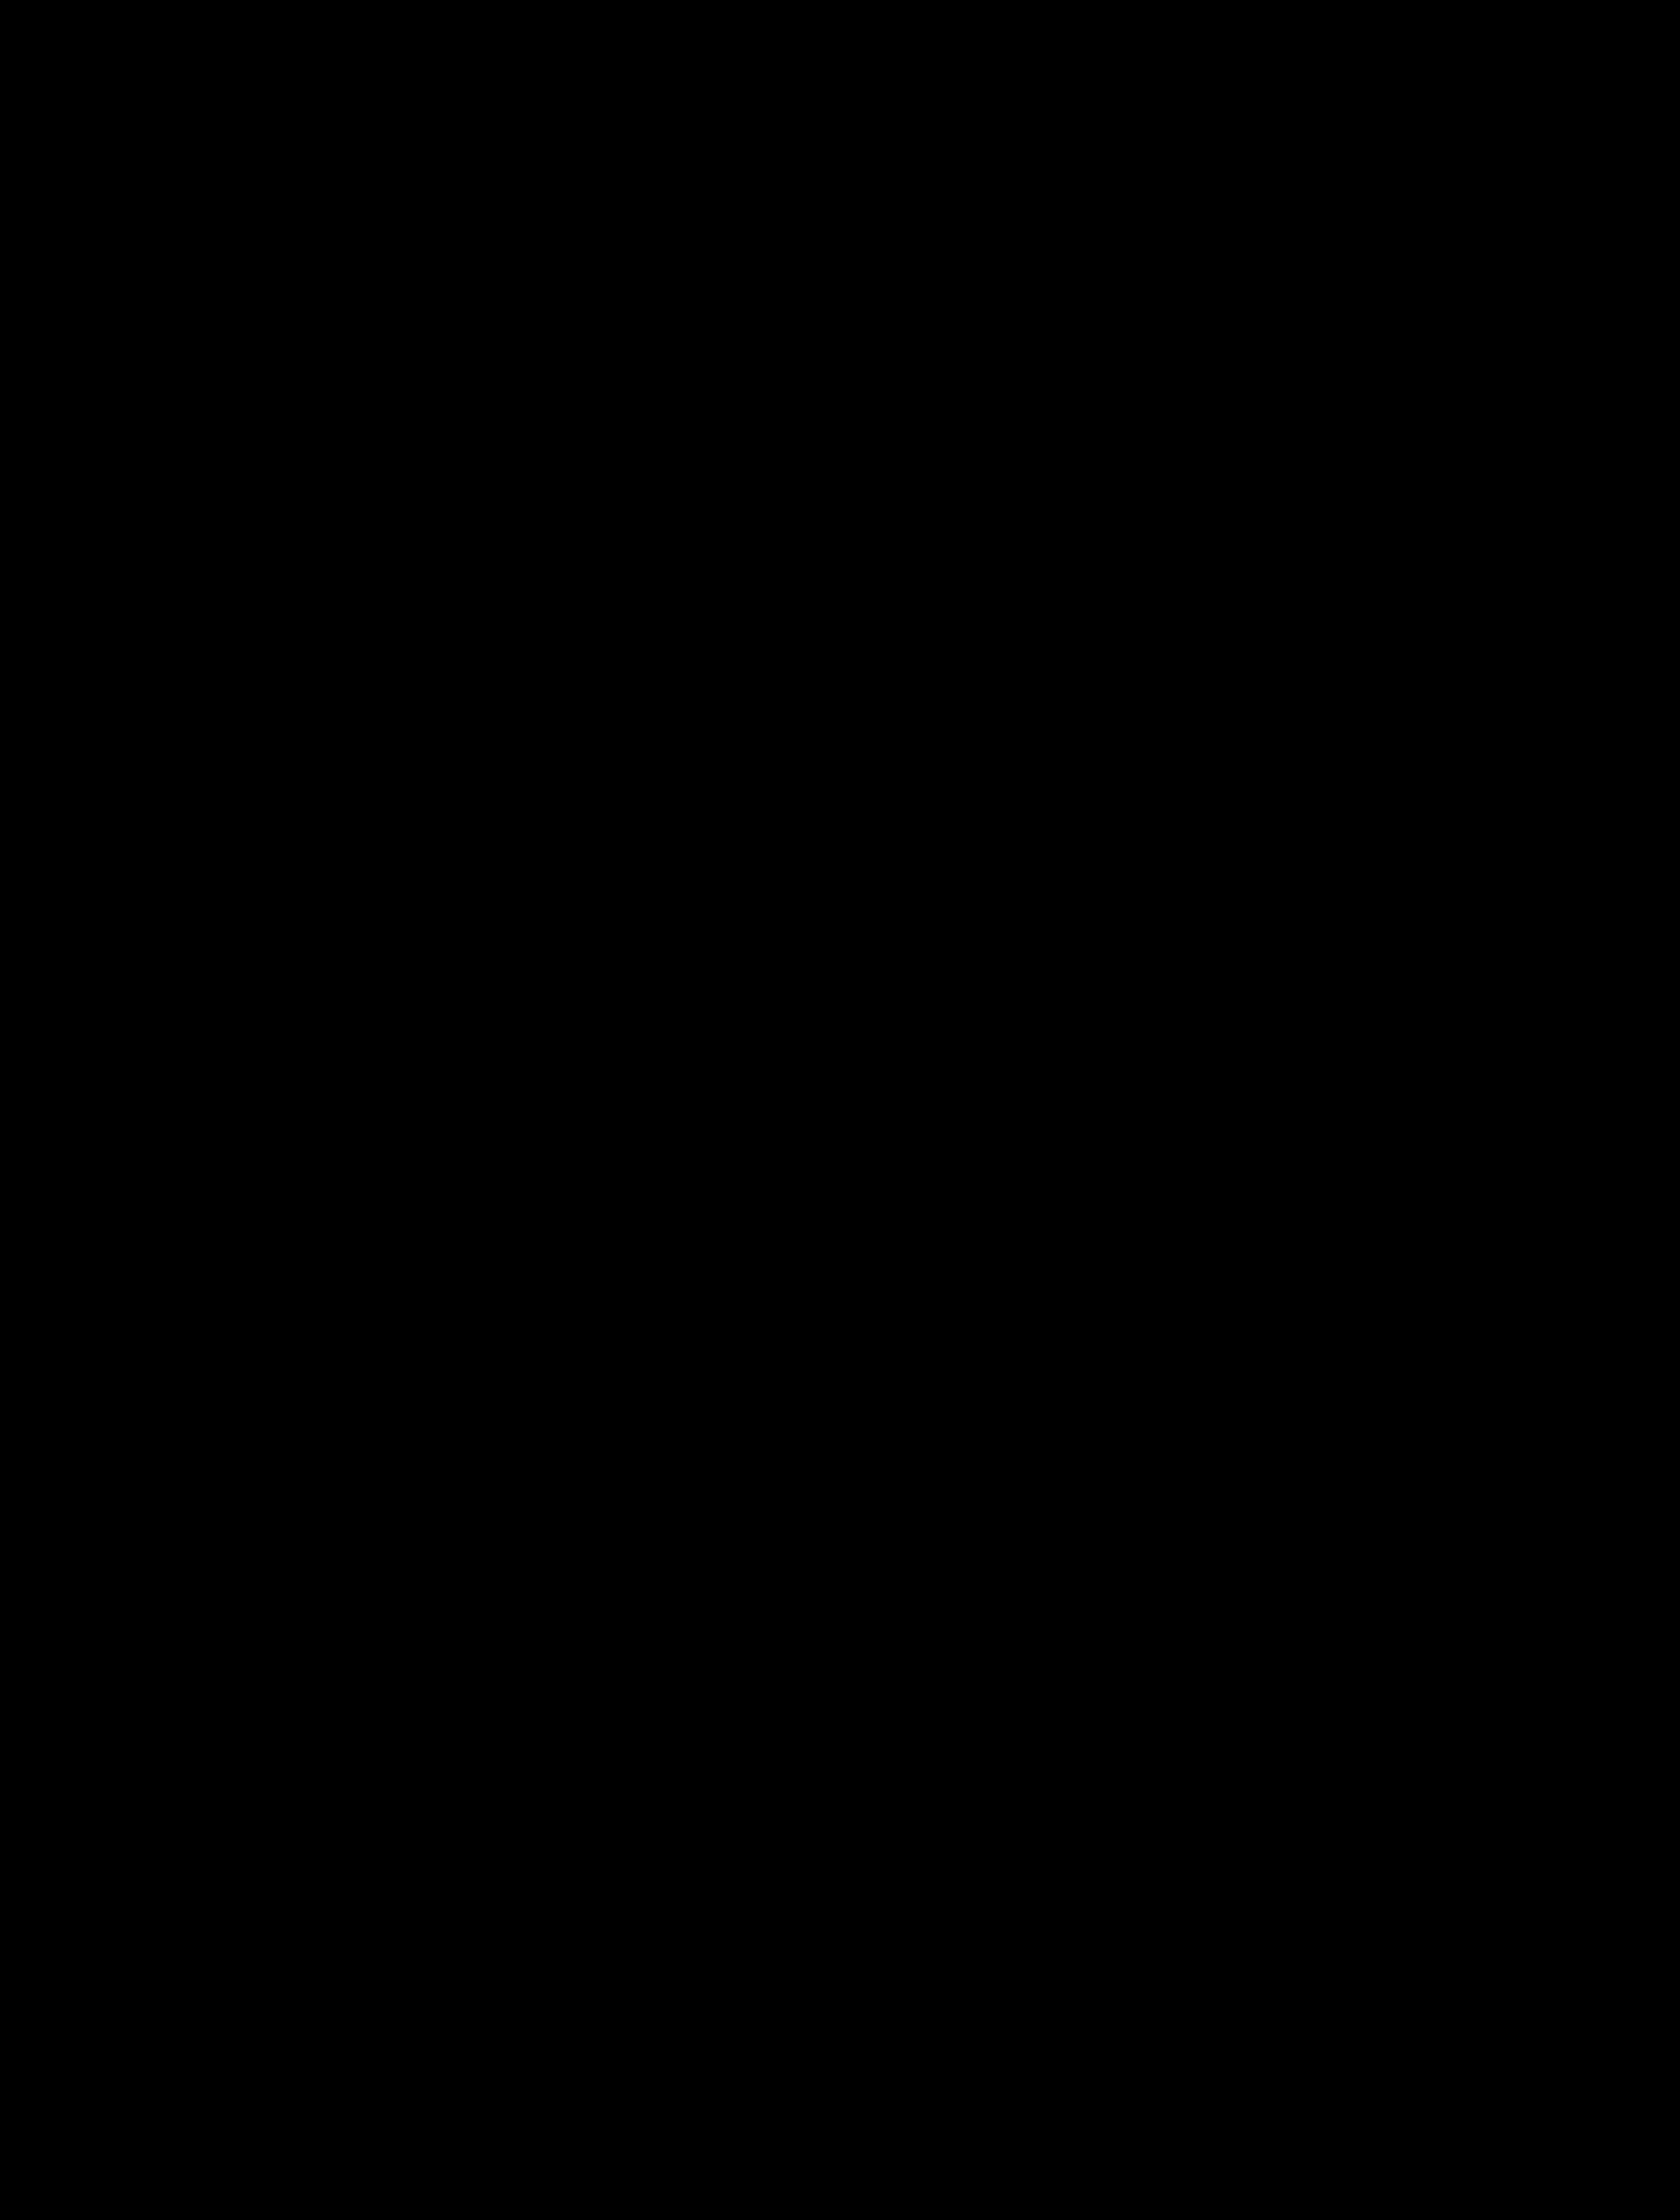 Cool clipart lightning bolt. Logo remix big image